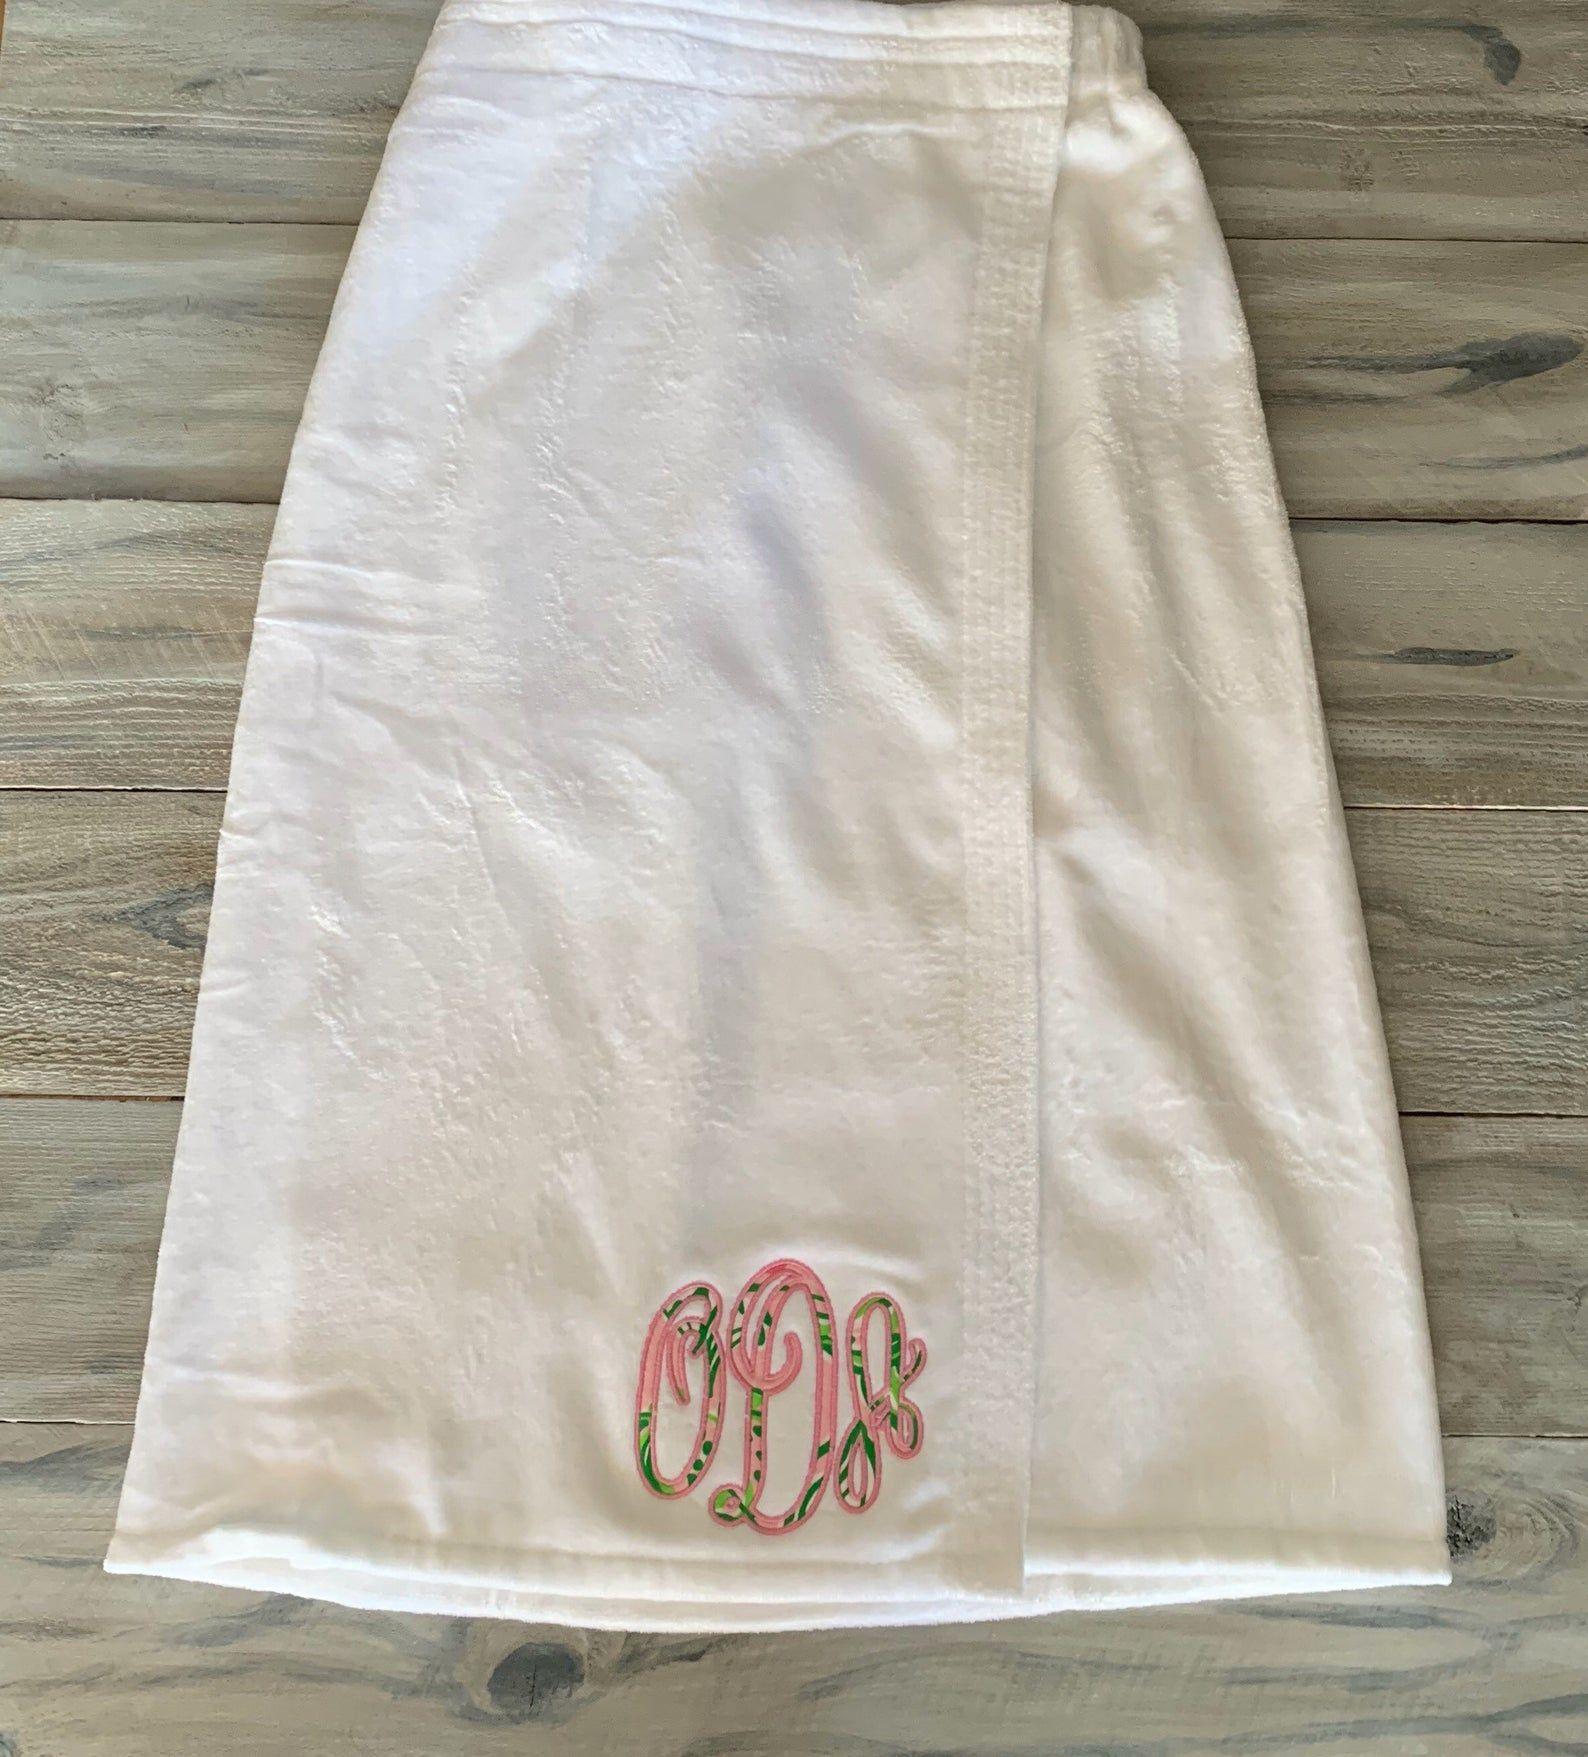 monogram monogram bath wrap Spa Wrap lilly pulitzer Bath Wrap Monogram Towel Wrap monogram Towel monogram shower wrap Towel wrap